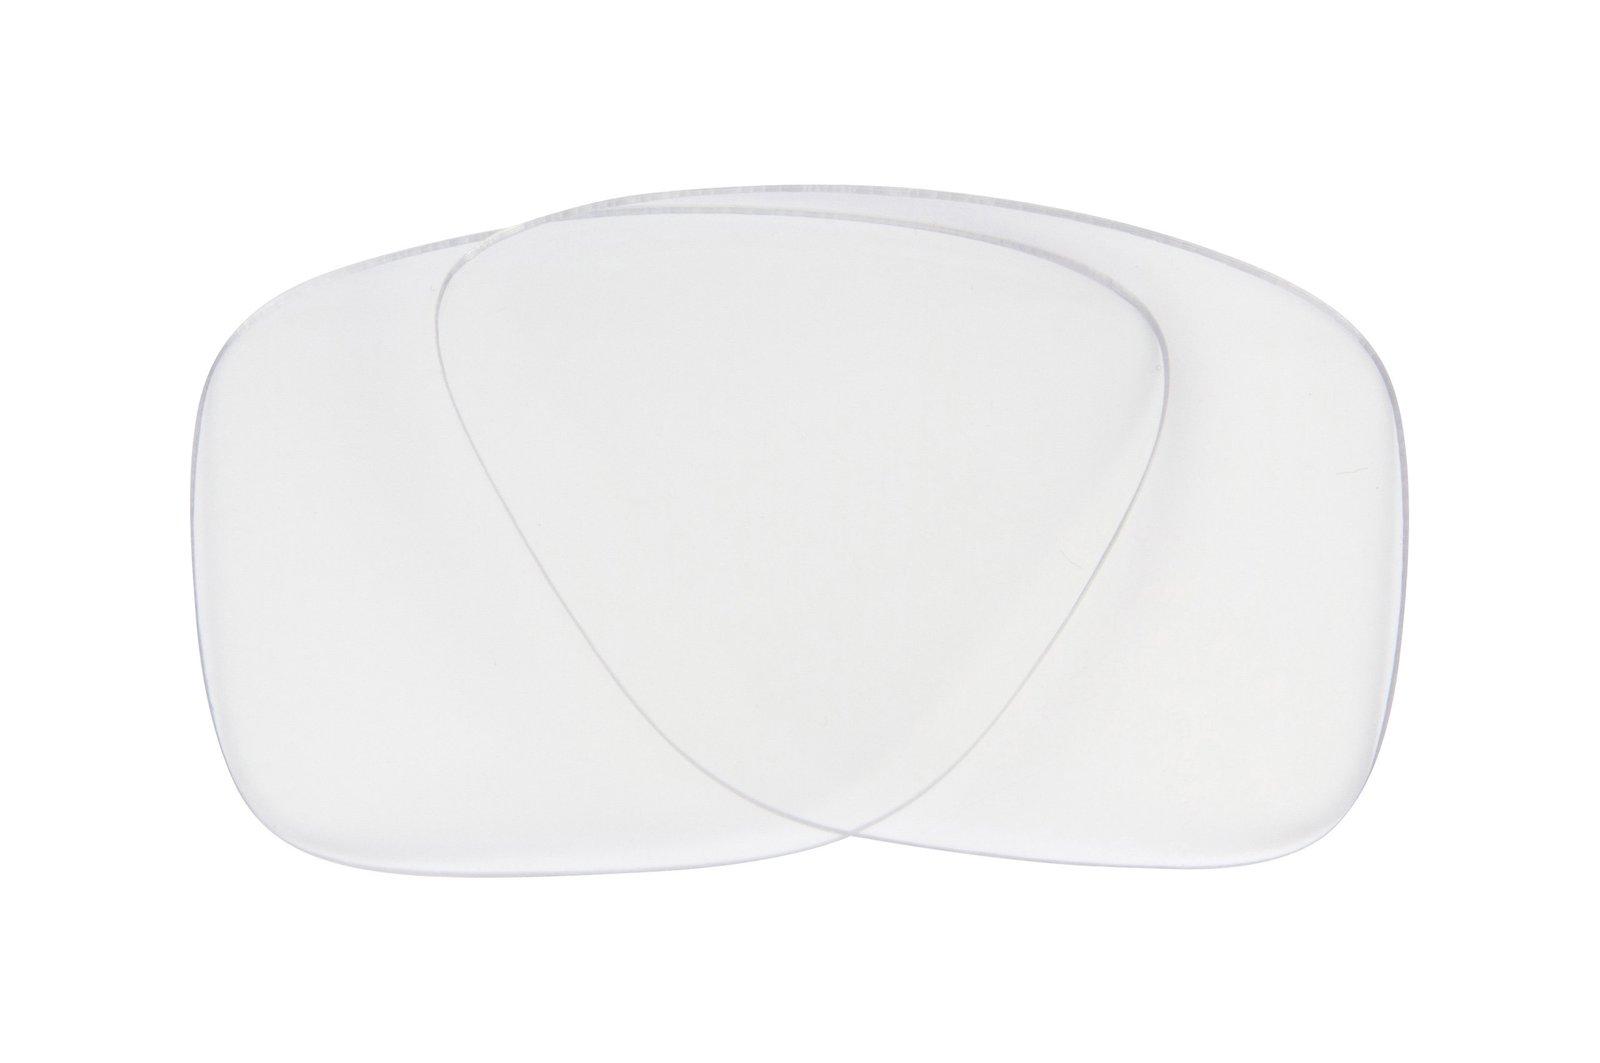 New SEEK OPTICS Replacement Lenses Oakley BREADBOX - Clear image 2